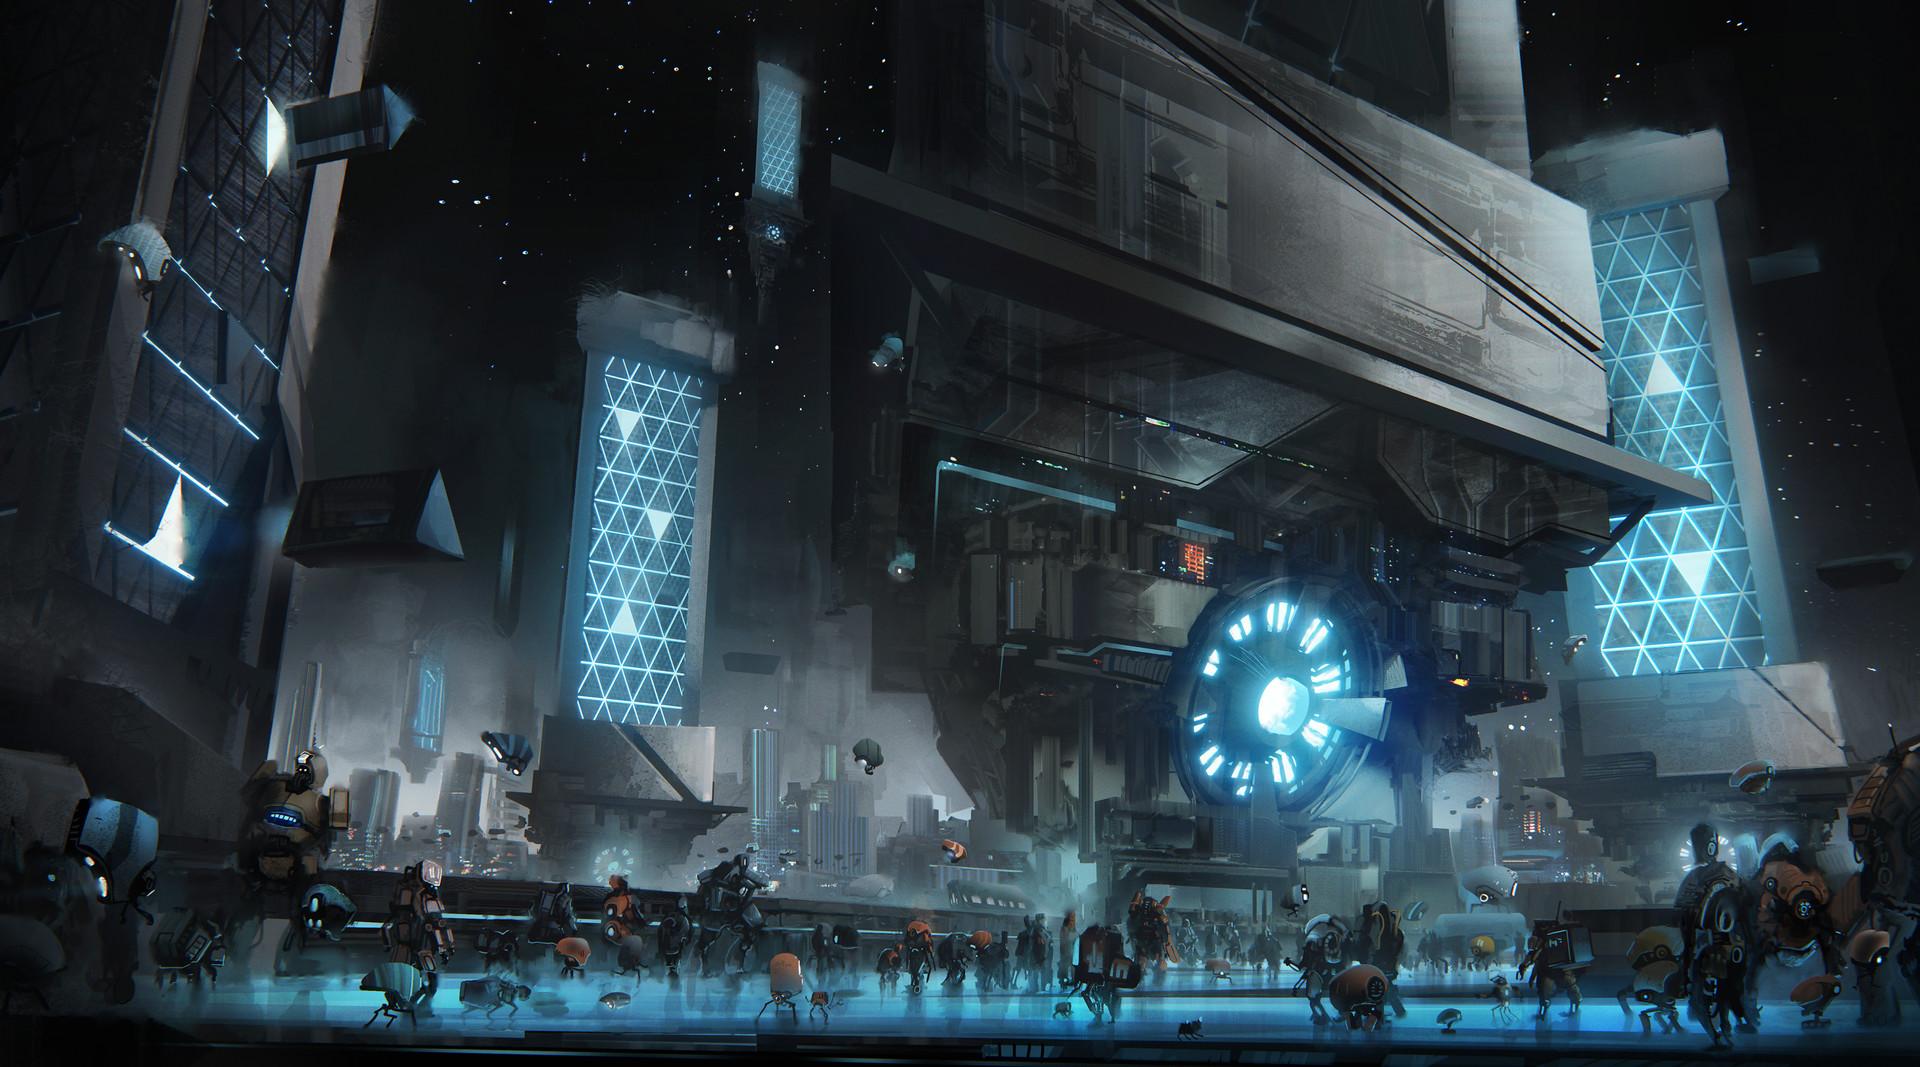 The Super Impressive Sci-Fi Art of Leon Tukker